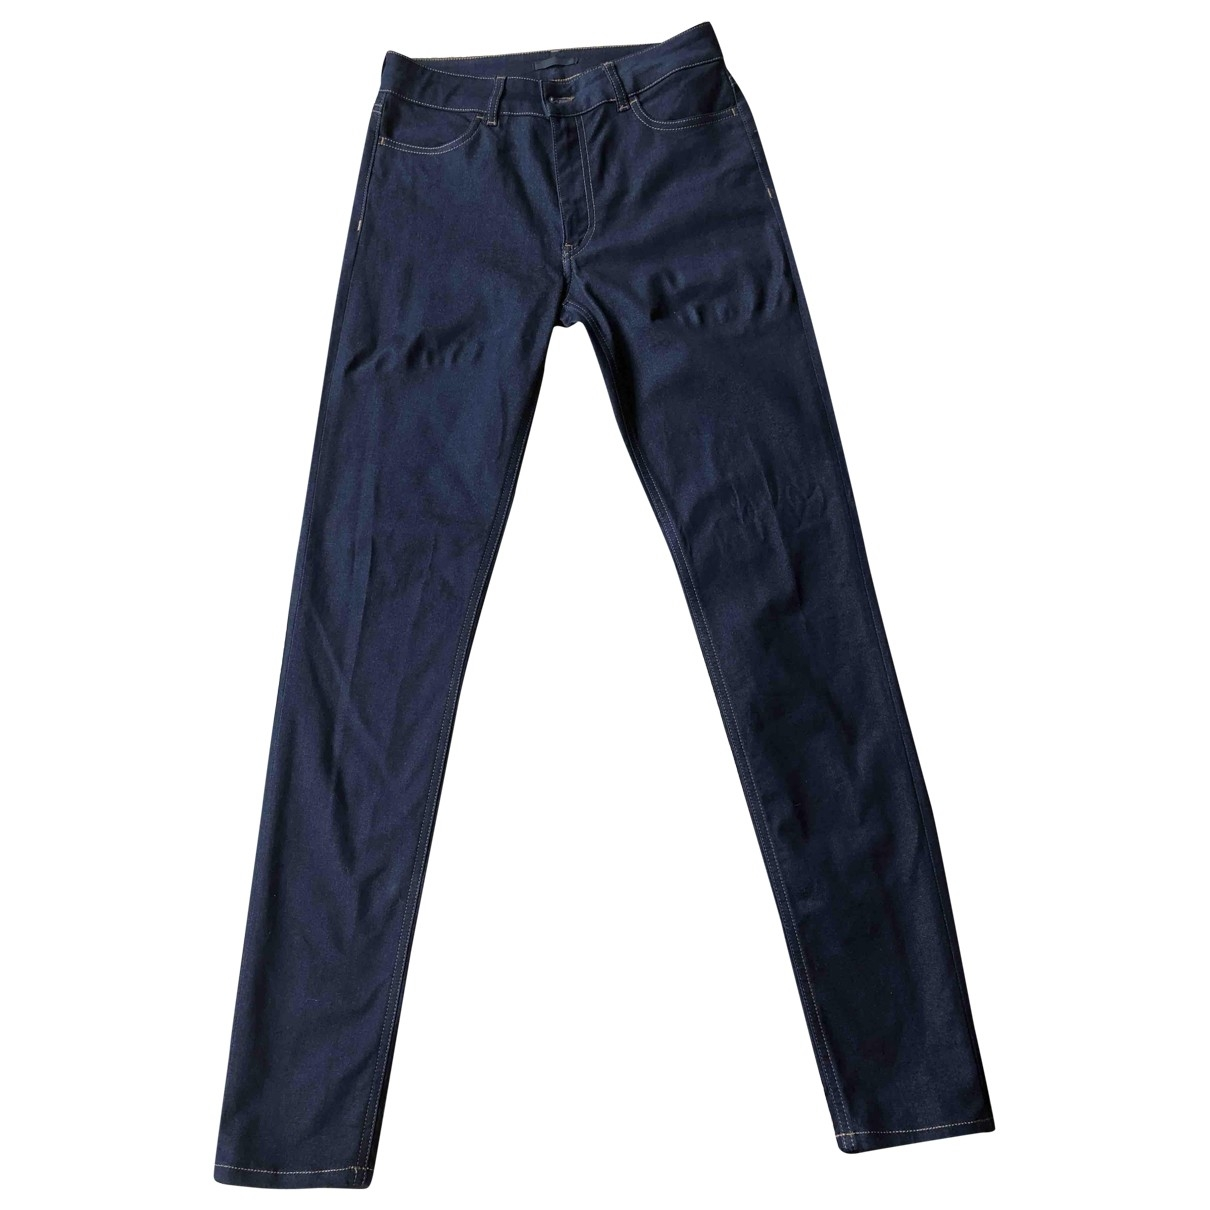 Prada \N Blue Cotton - elasthane Jeans for Women 30 US